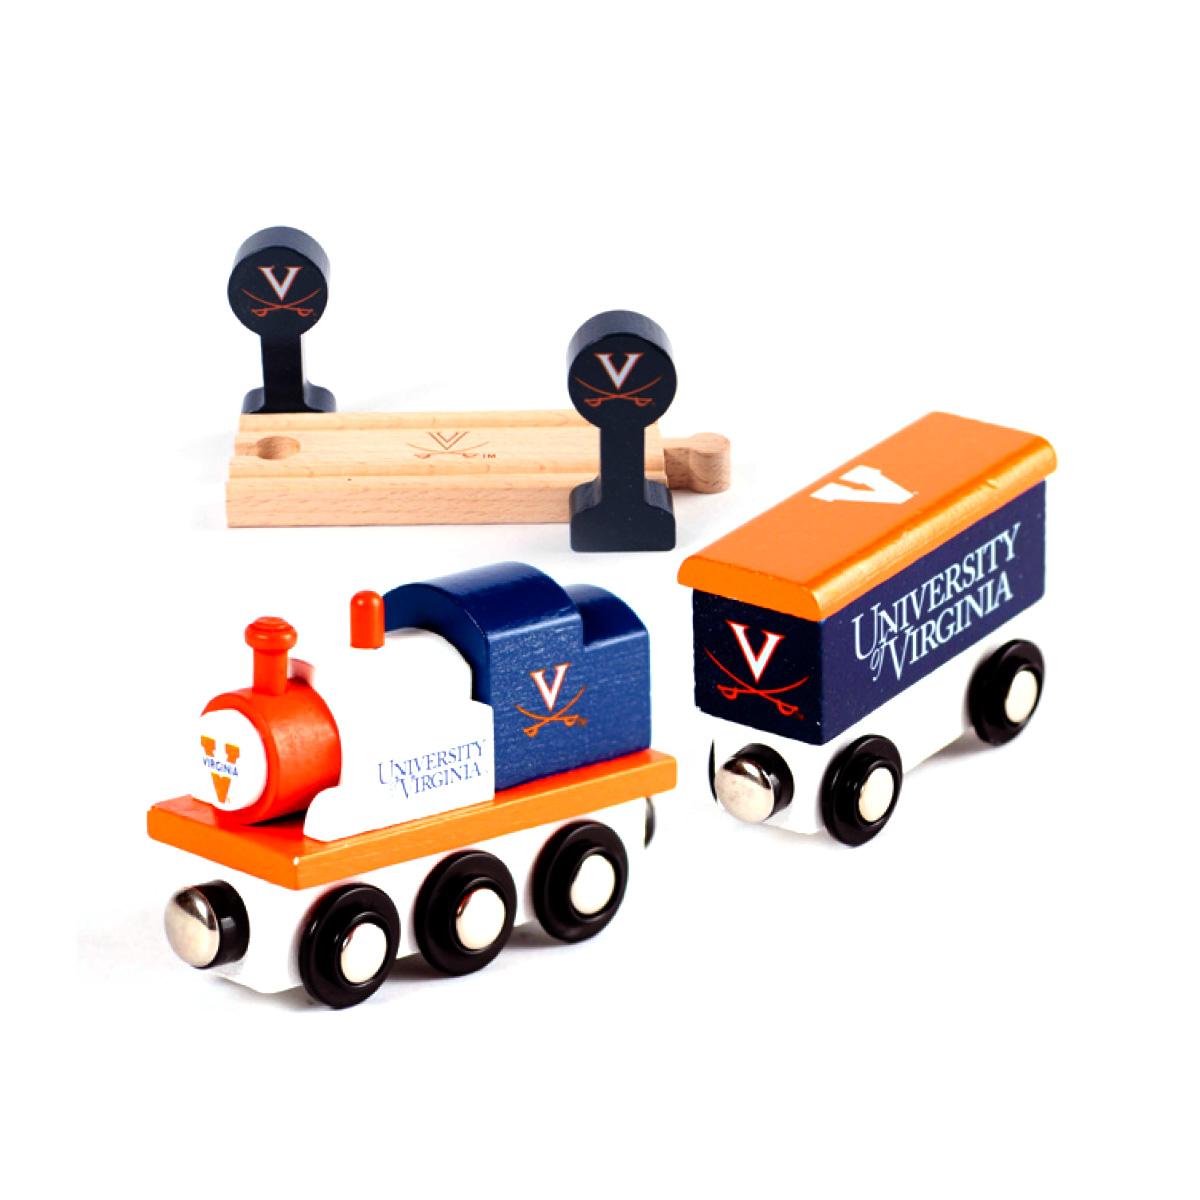 University of Virginia Toy Train Set